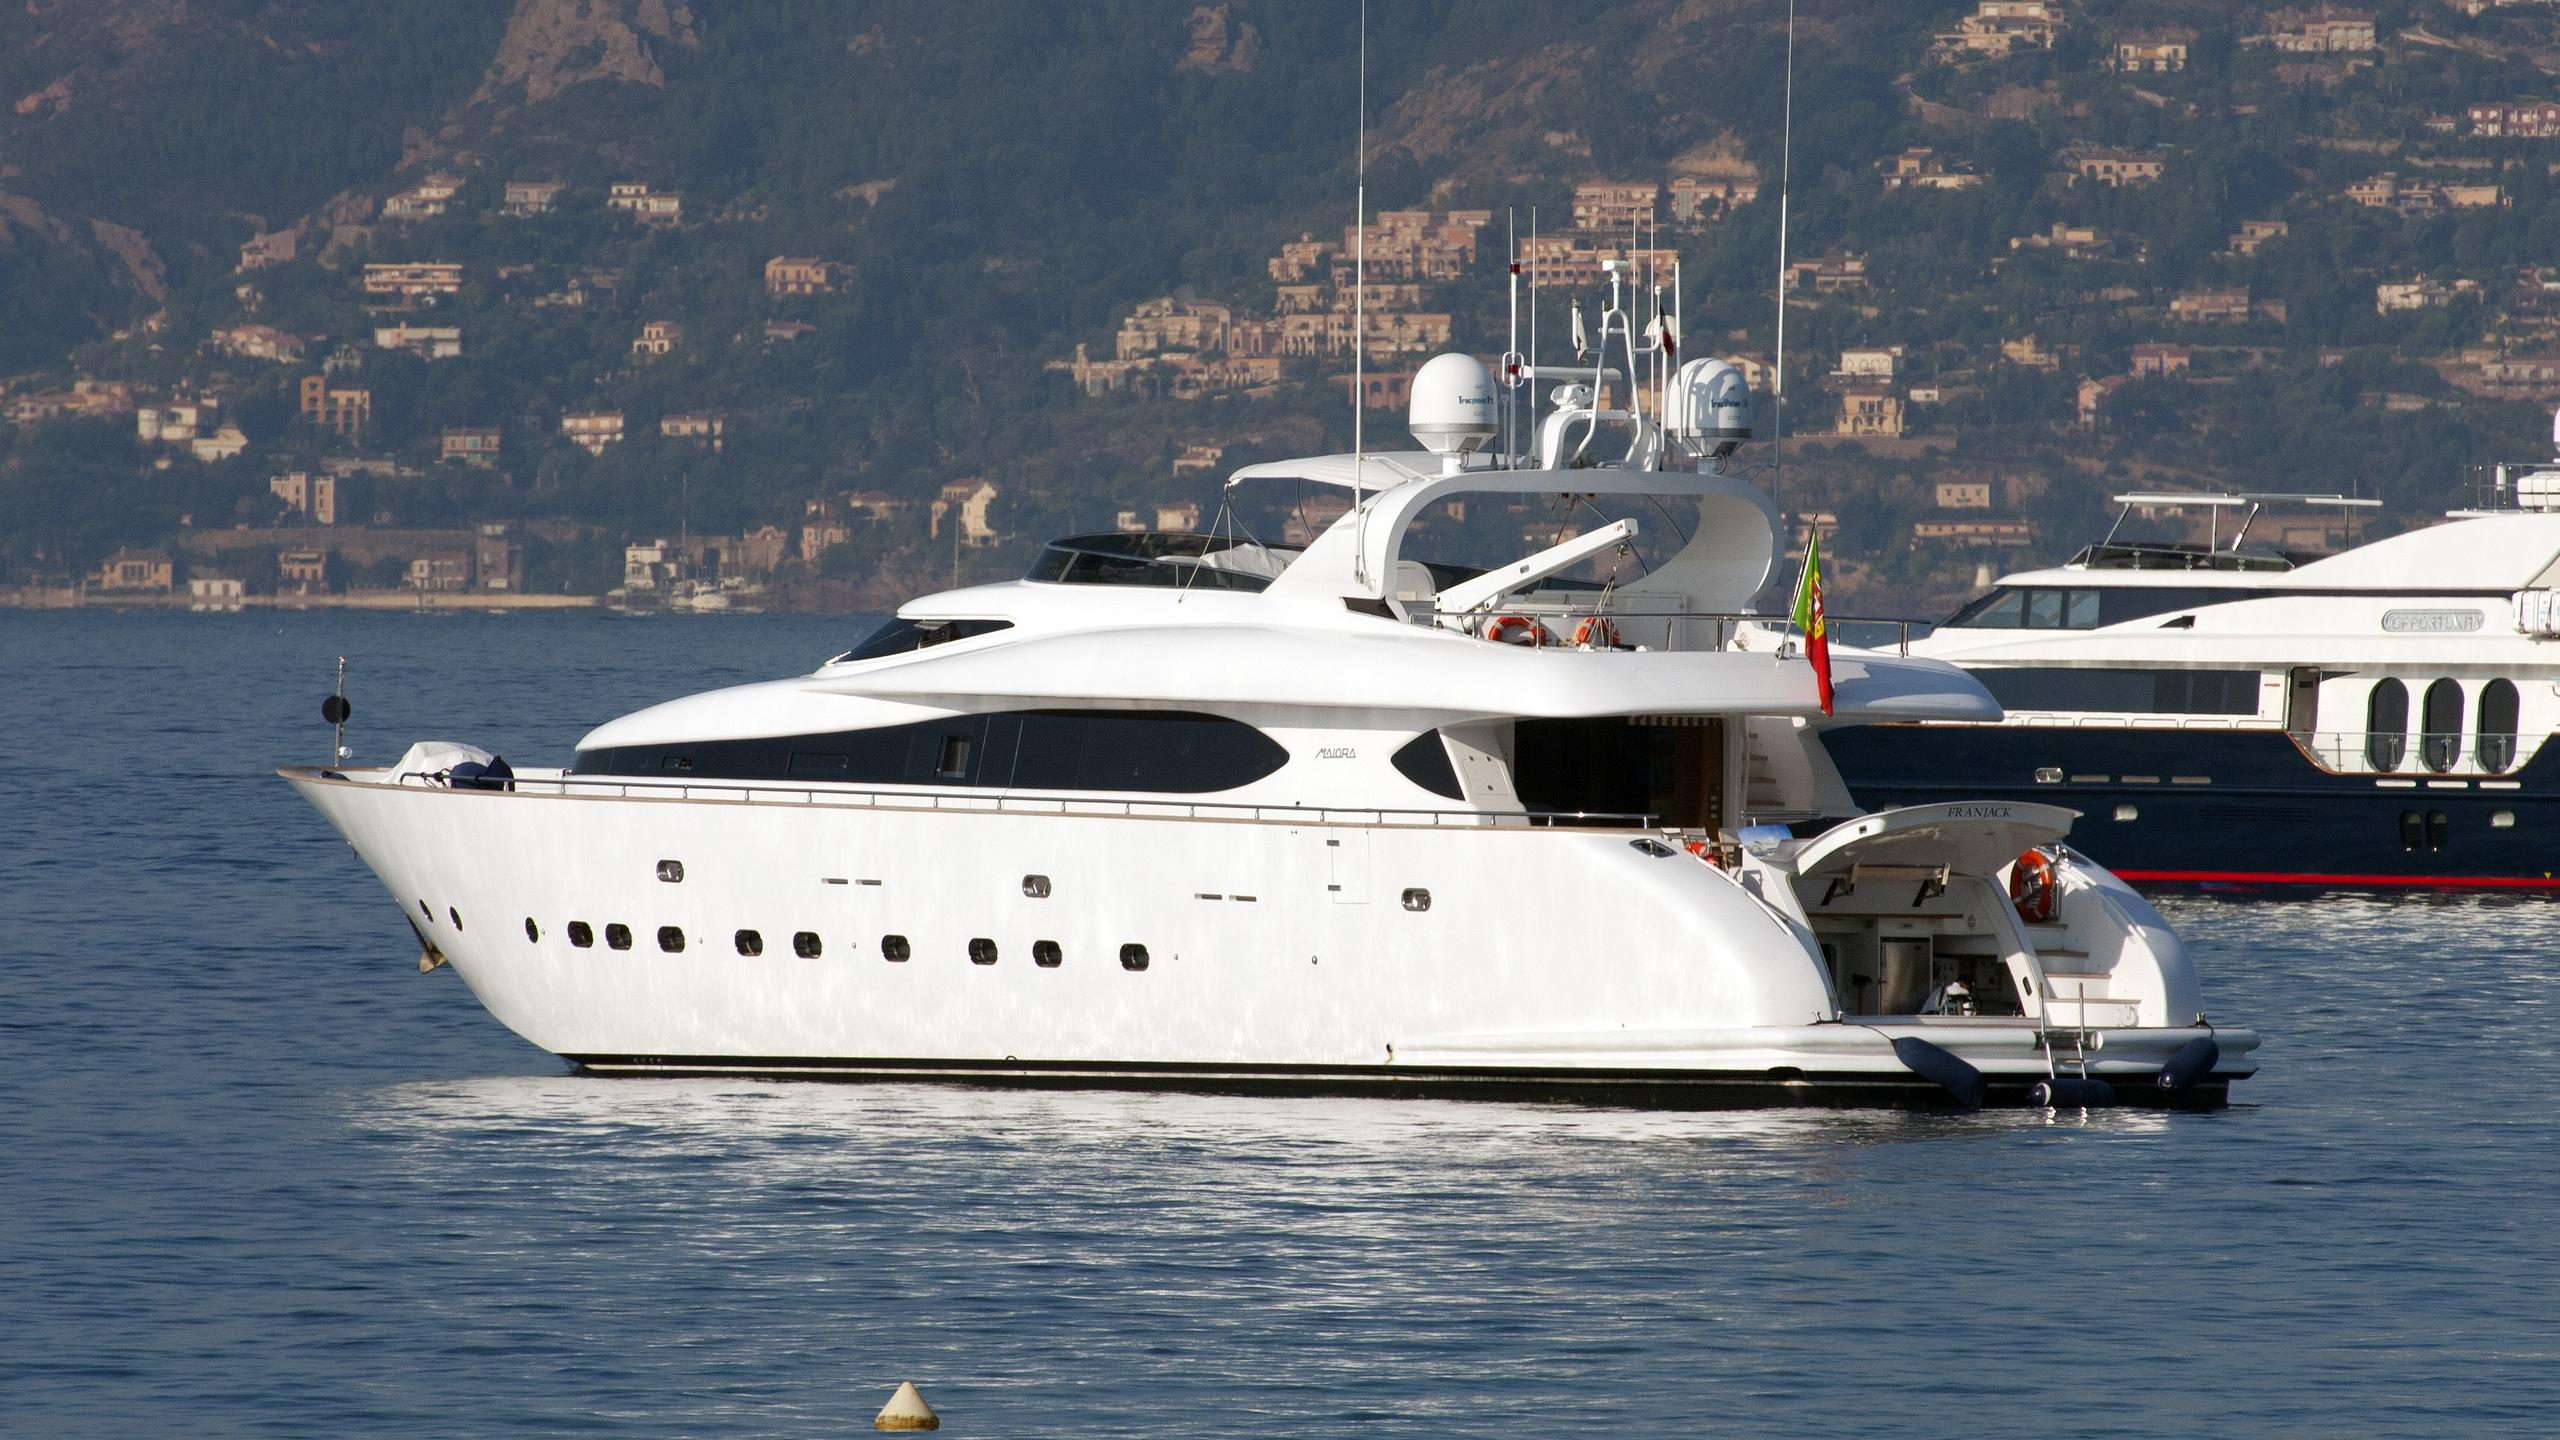 franjack-motor-yacht-maiora-31dp-2005-31m-profile